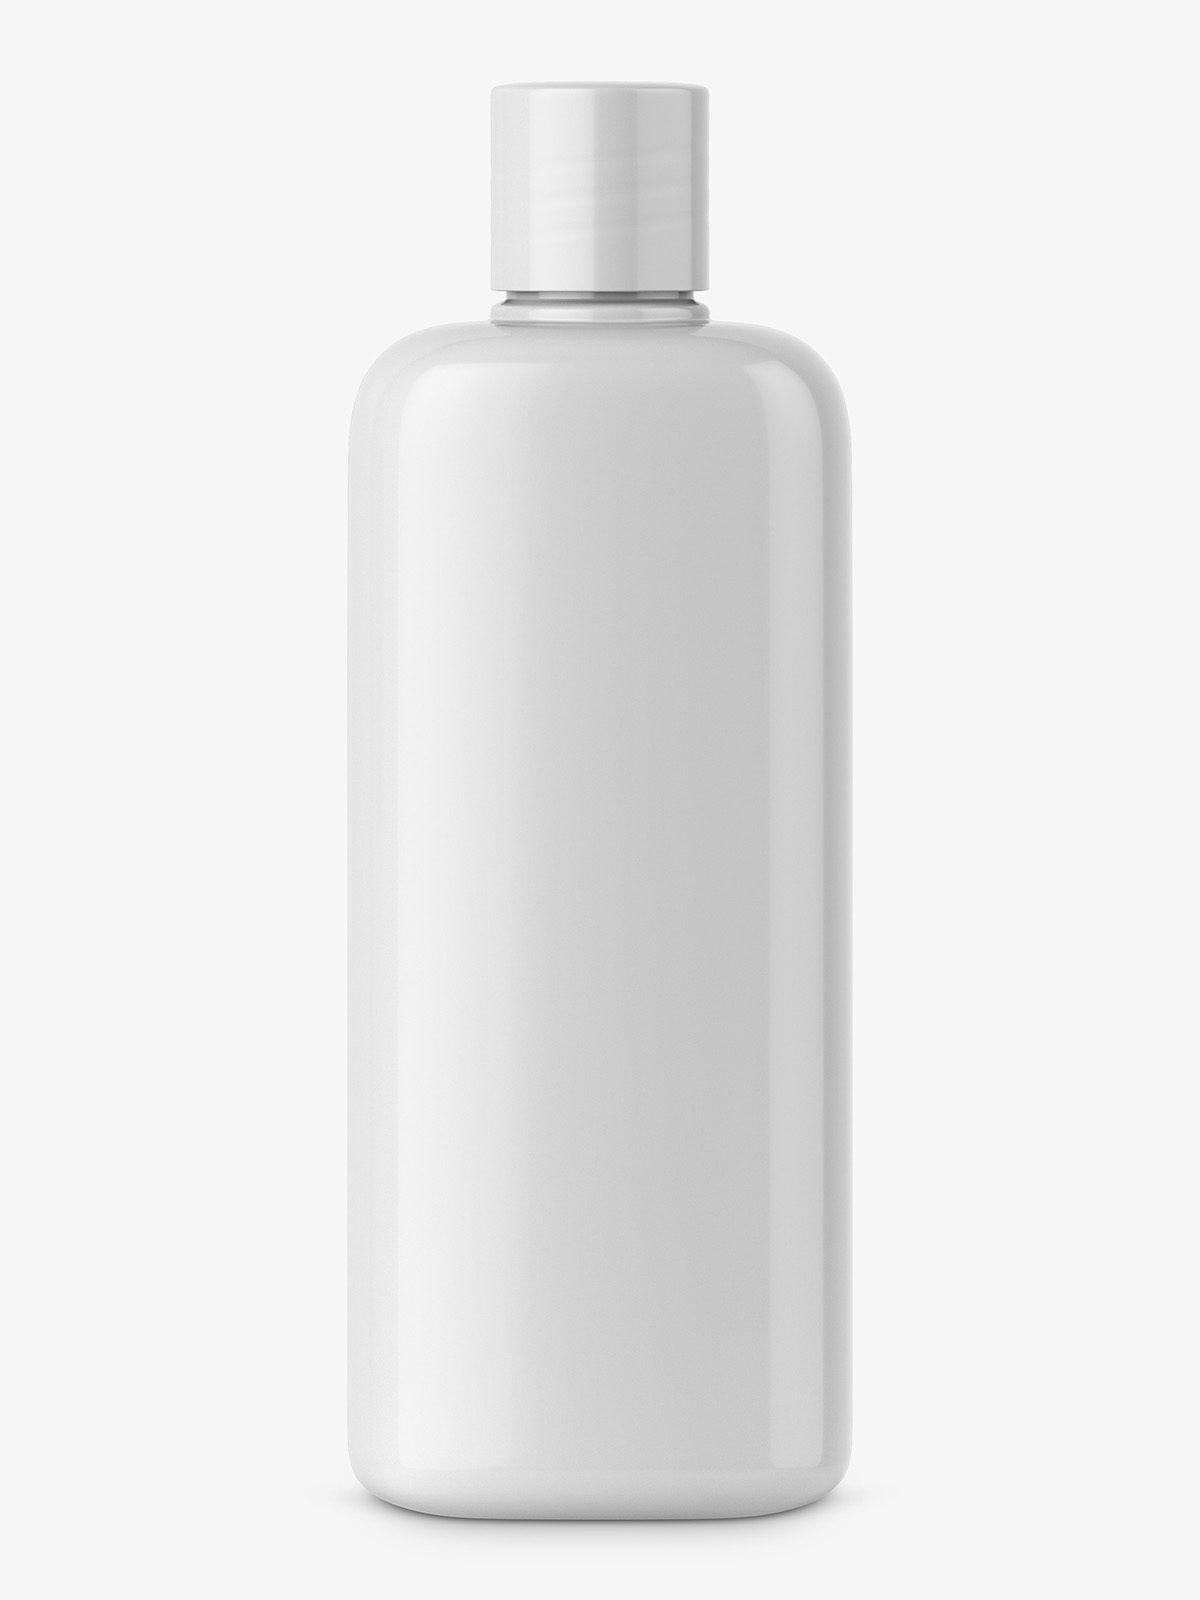 Glossy cosmetic bottle mockup